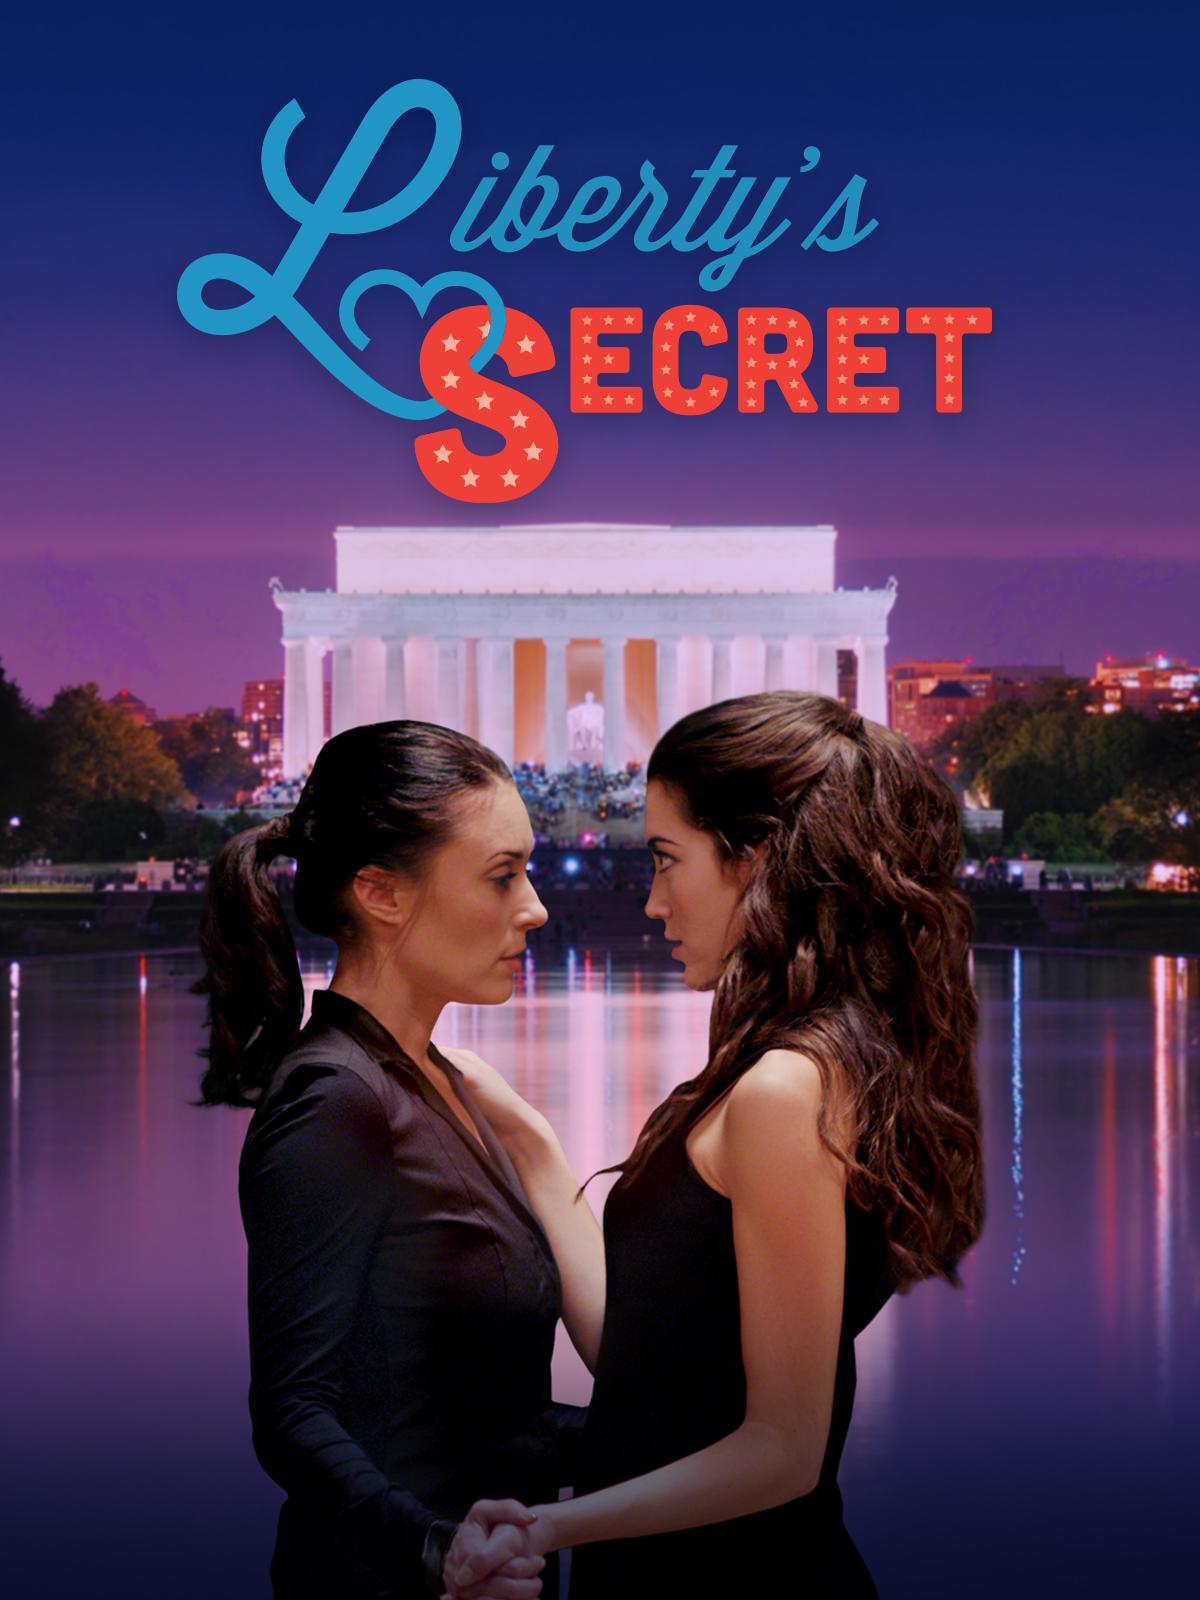 image Liberty's Secret Watch Full Movie Free Online